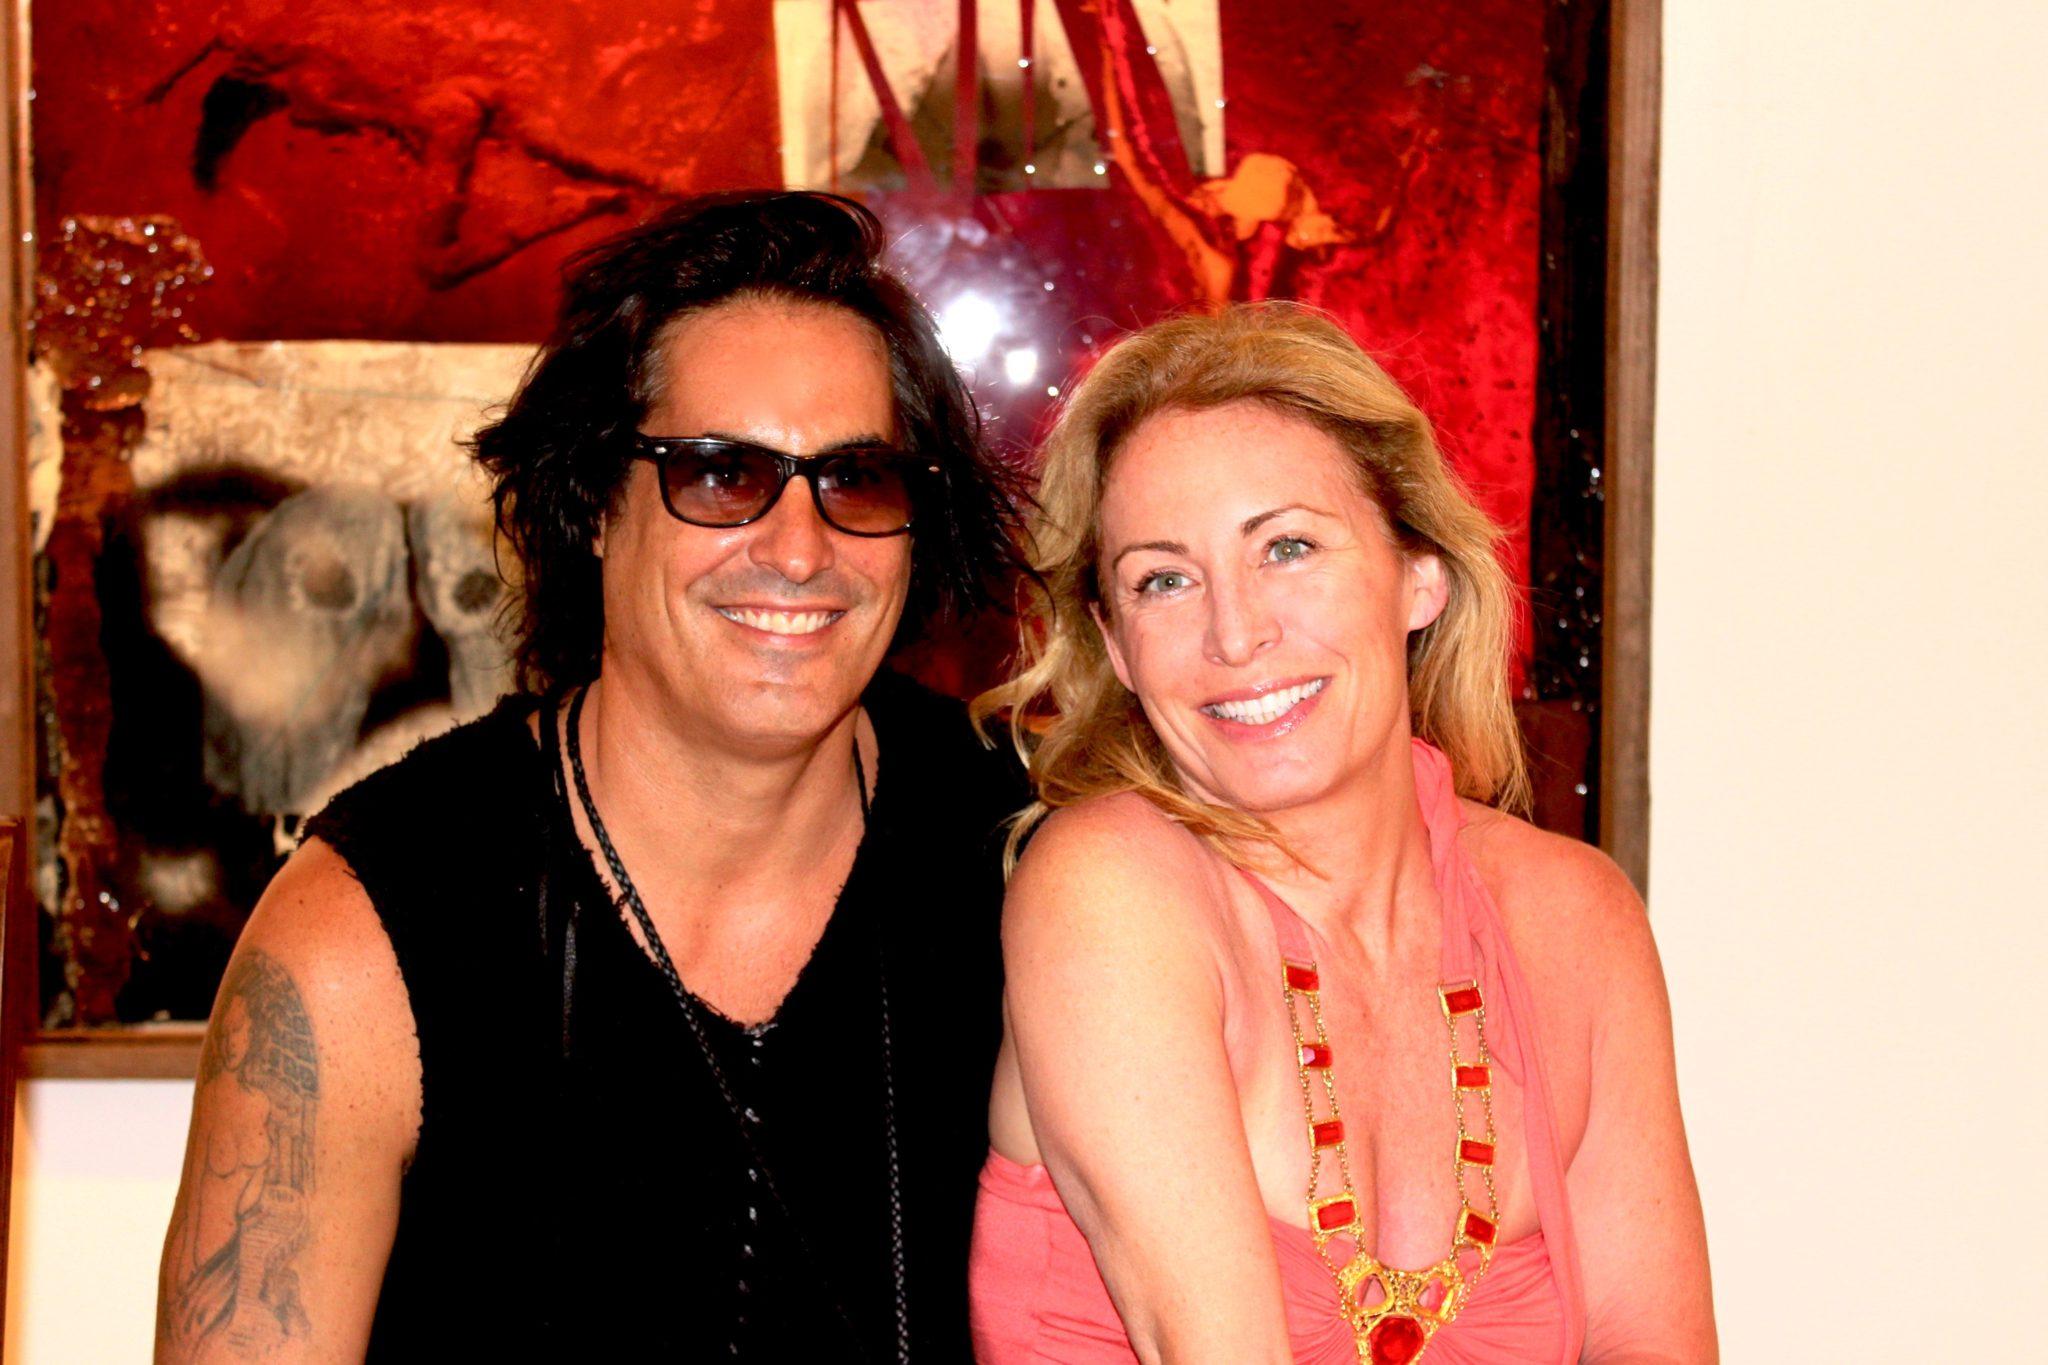 Artist Raphael Mazzucco & Diana Pinck at Arthamptons July 2013